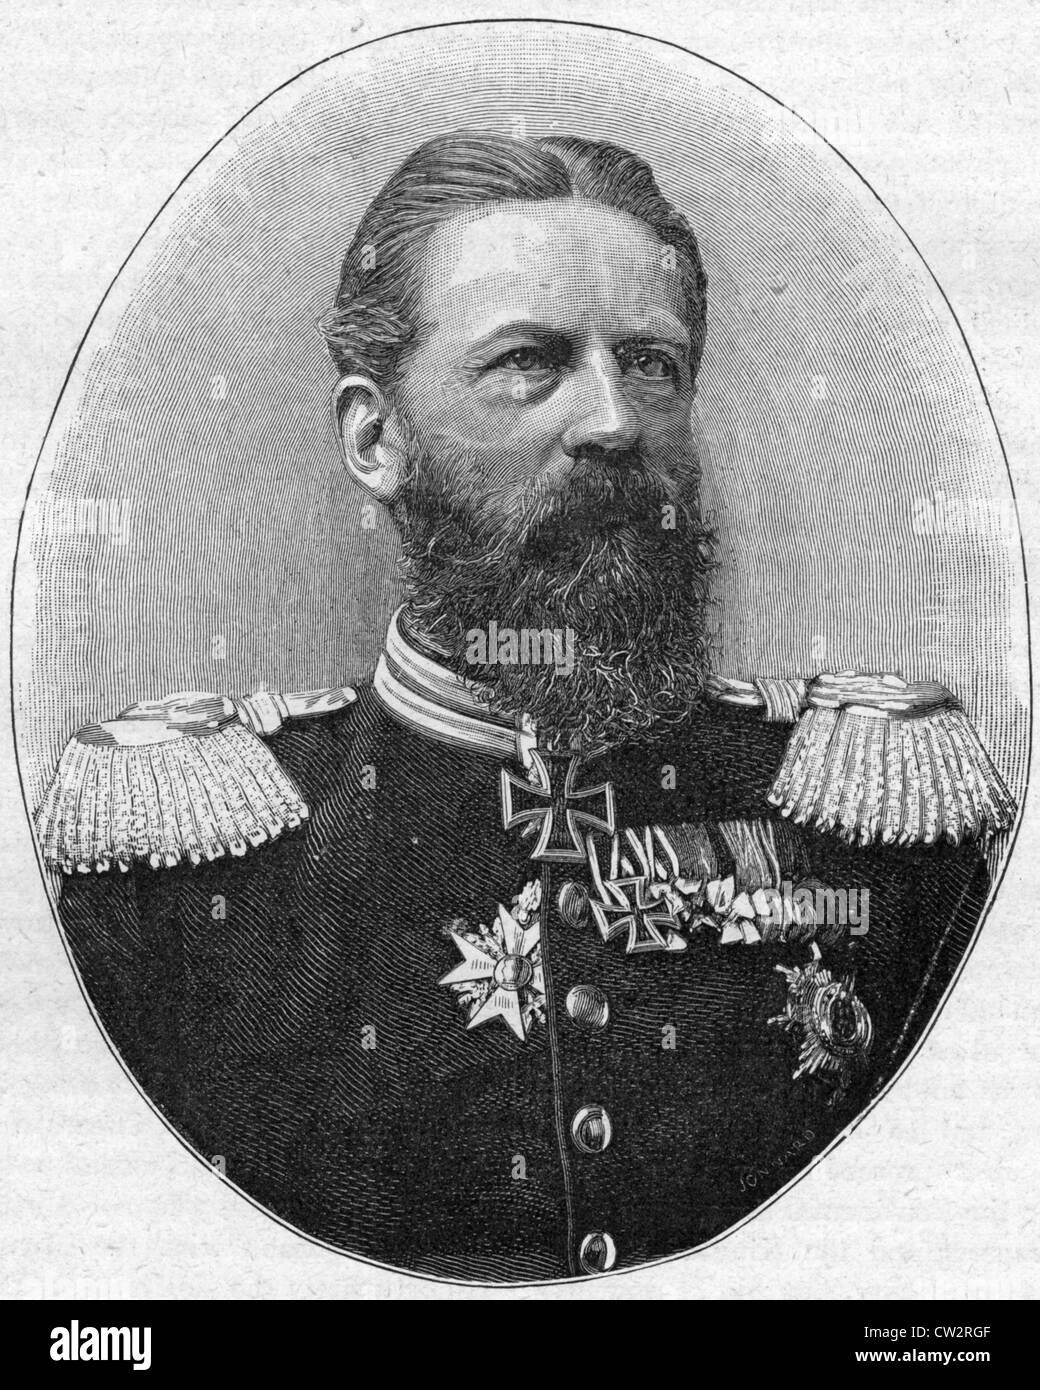 GERMAN EMPEROR FREDERICK III (1831-1888) - Stock Image